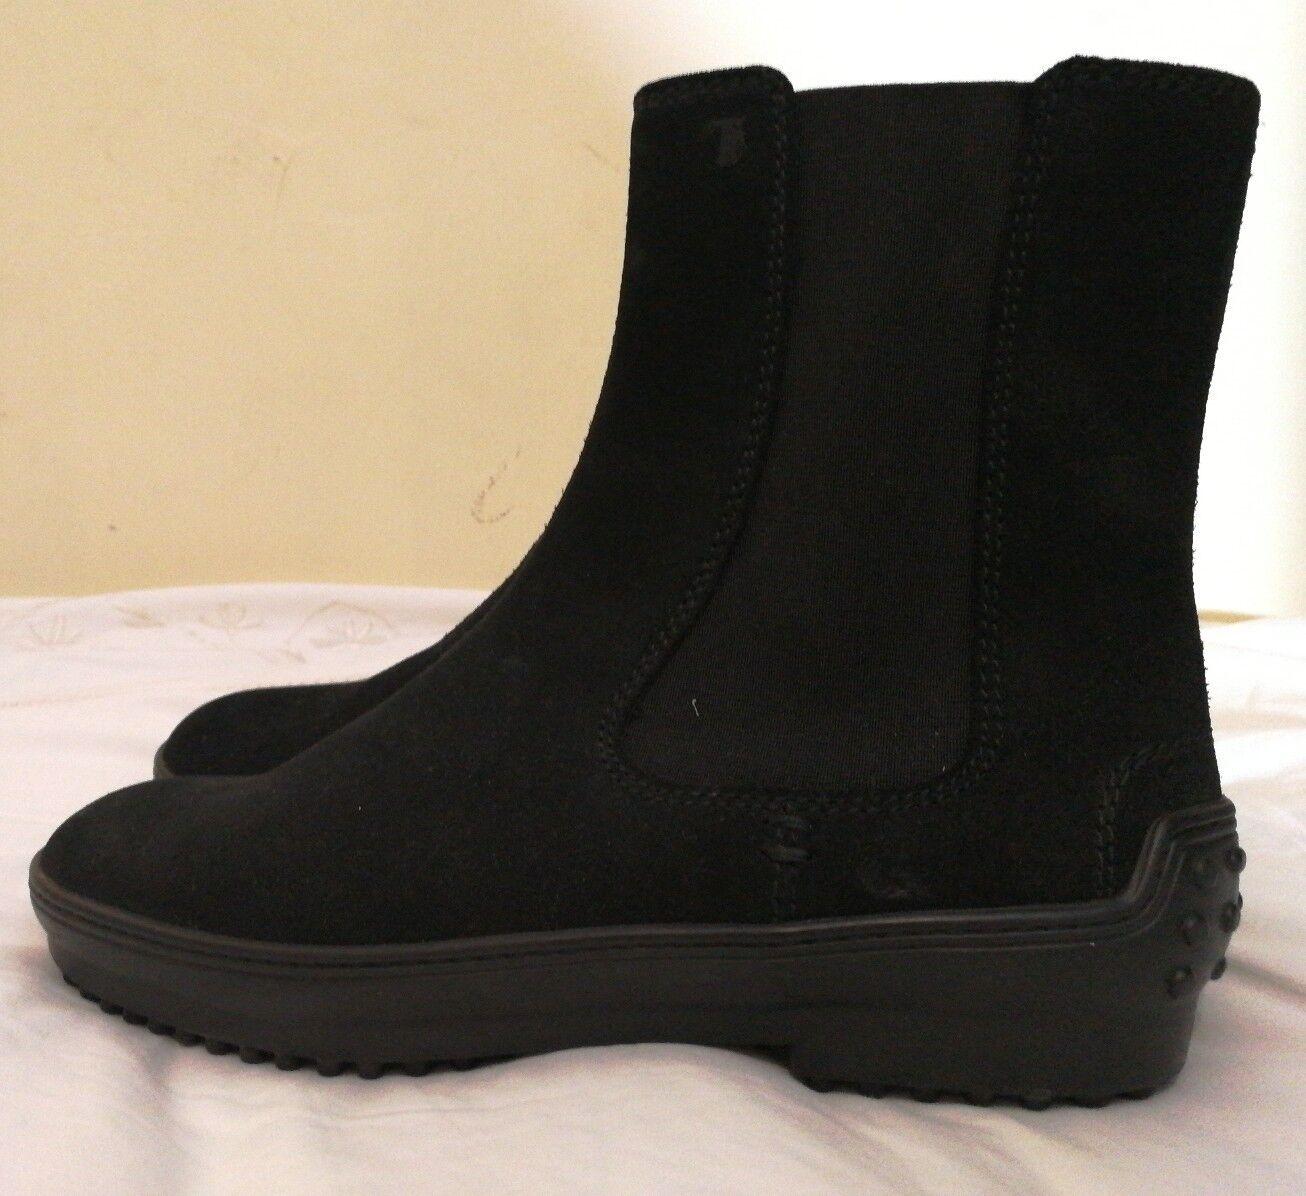 Tod's Suede Chelsea Ankle Boots Black Size uk 2.5 eu eu eu 35.5 759ba7